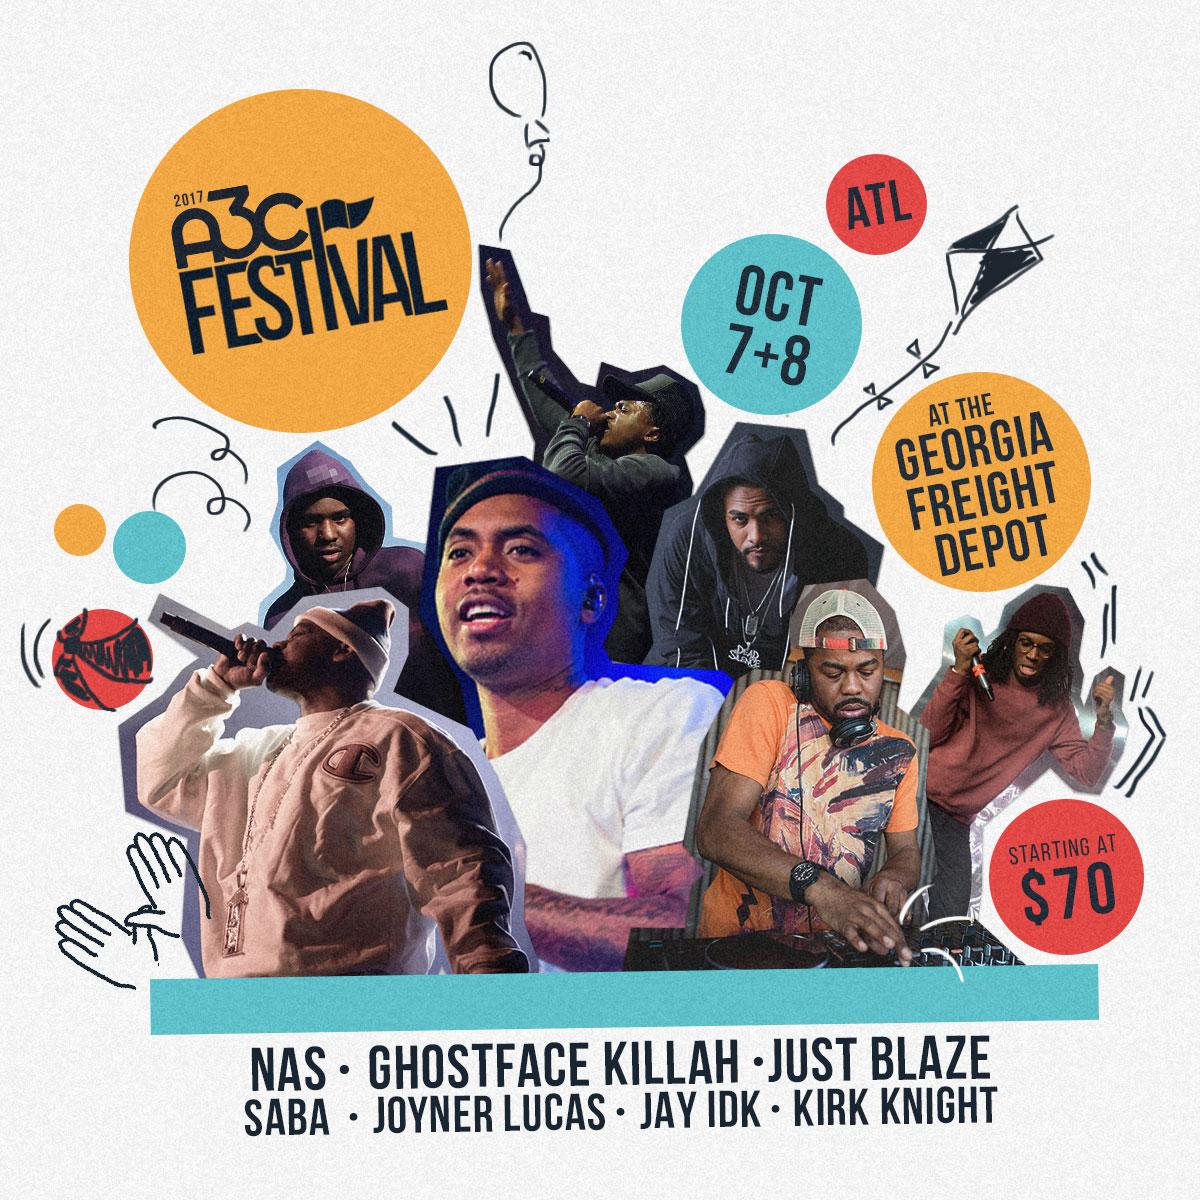 2017 A3C Artist Festival -Announcement V1.jpg